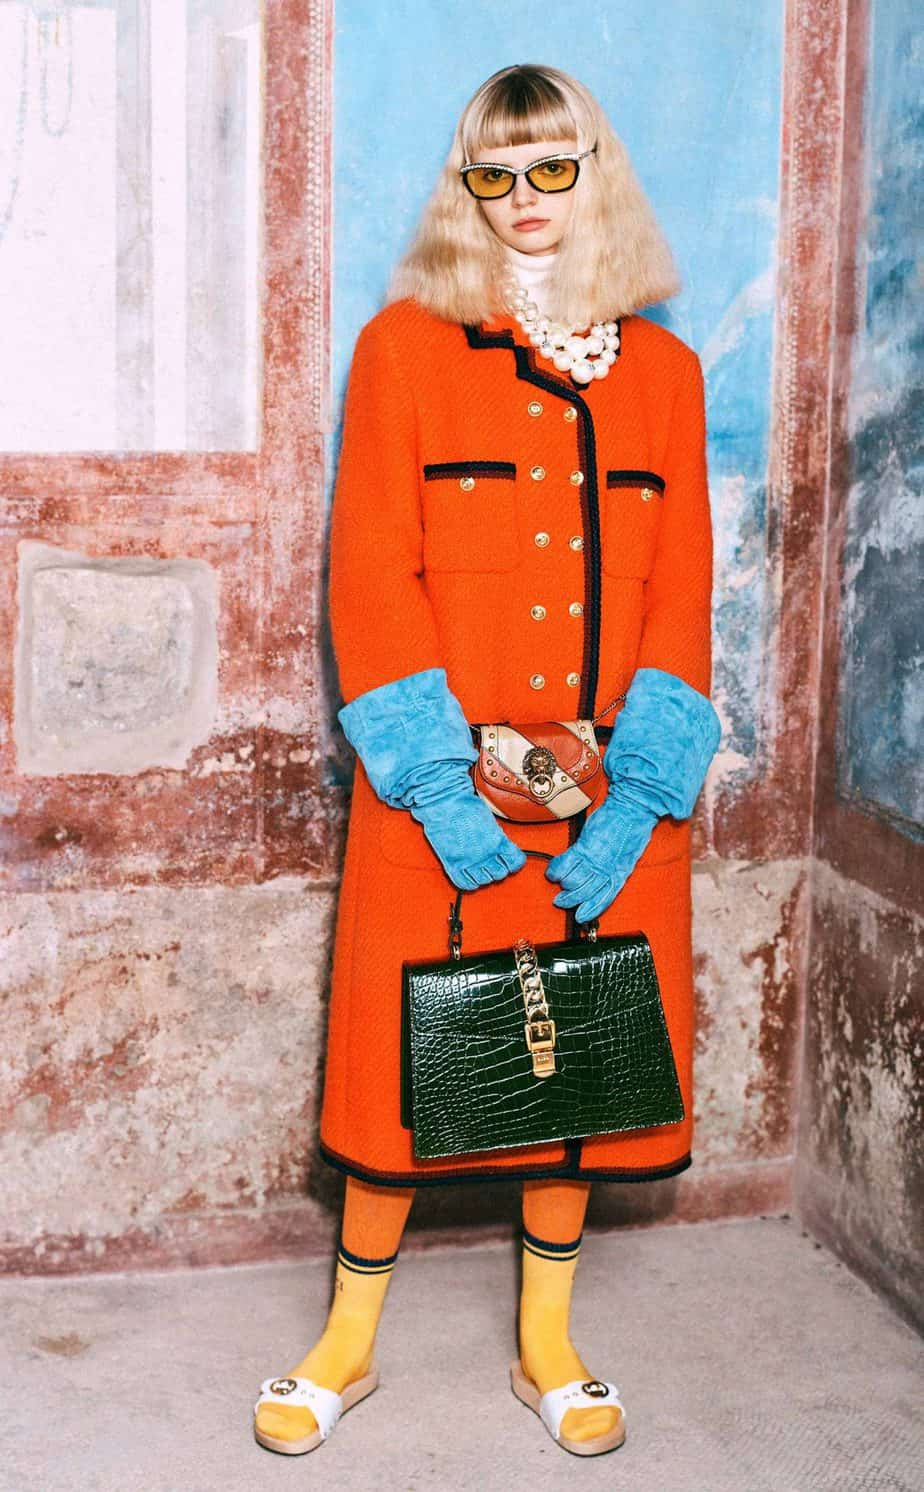 GUCCI, FALL 2019. WOMEN'S FASHION, Photographer Harmony Korine, Art Director, Christopher Simmonds - 15